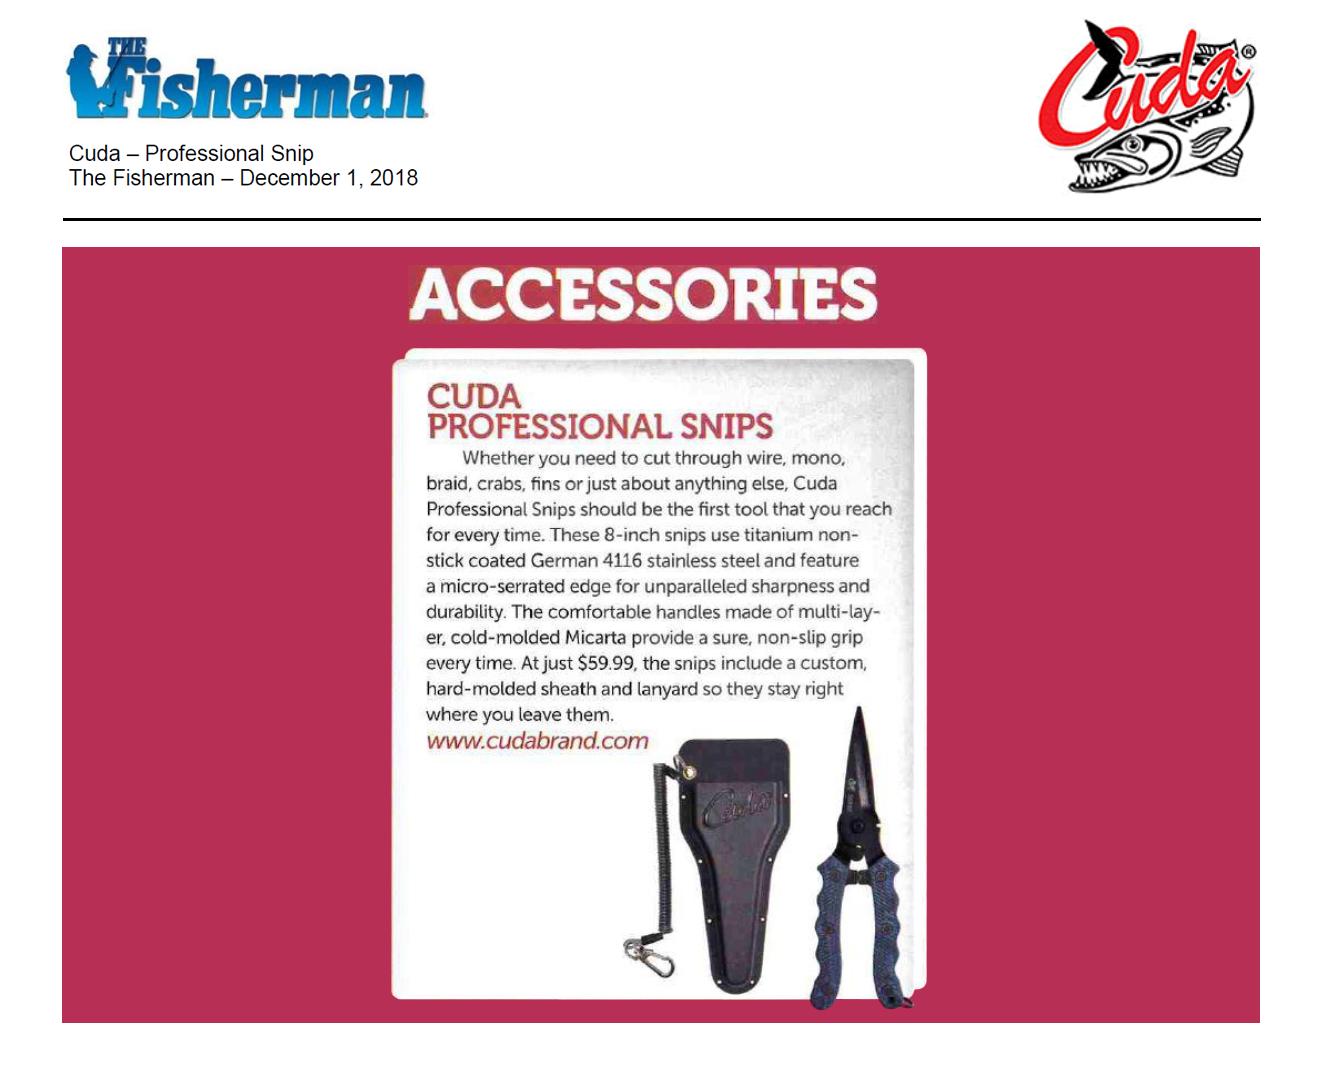 Cuda Professional Snips - Featured in Fisherman Dec 1, 2018